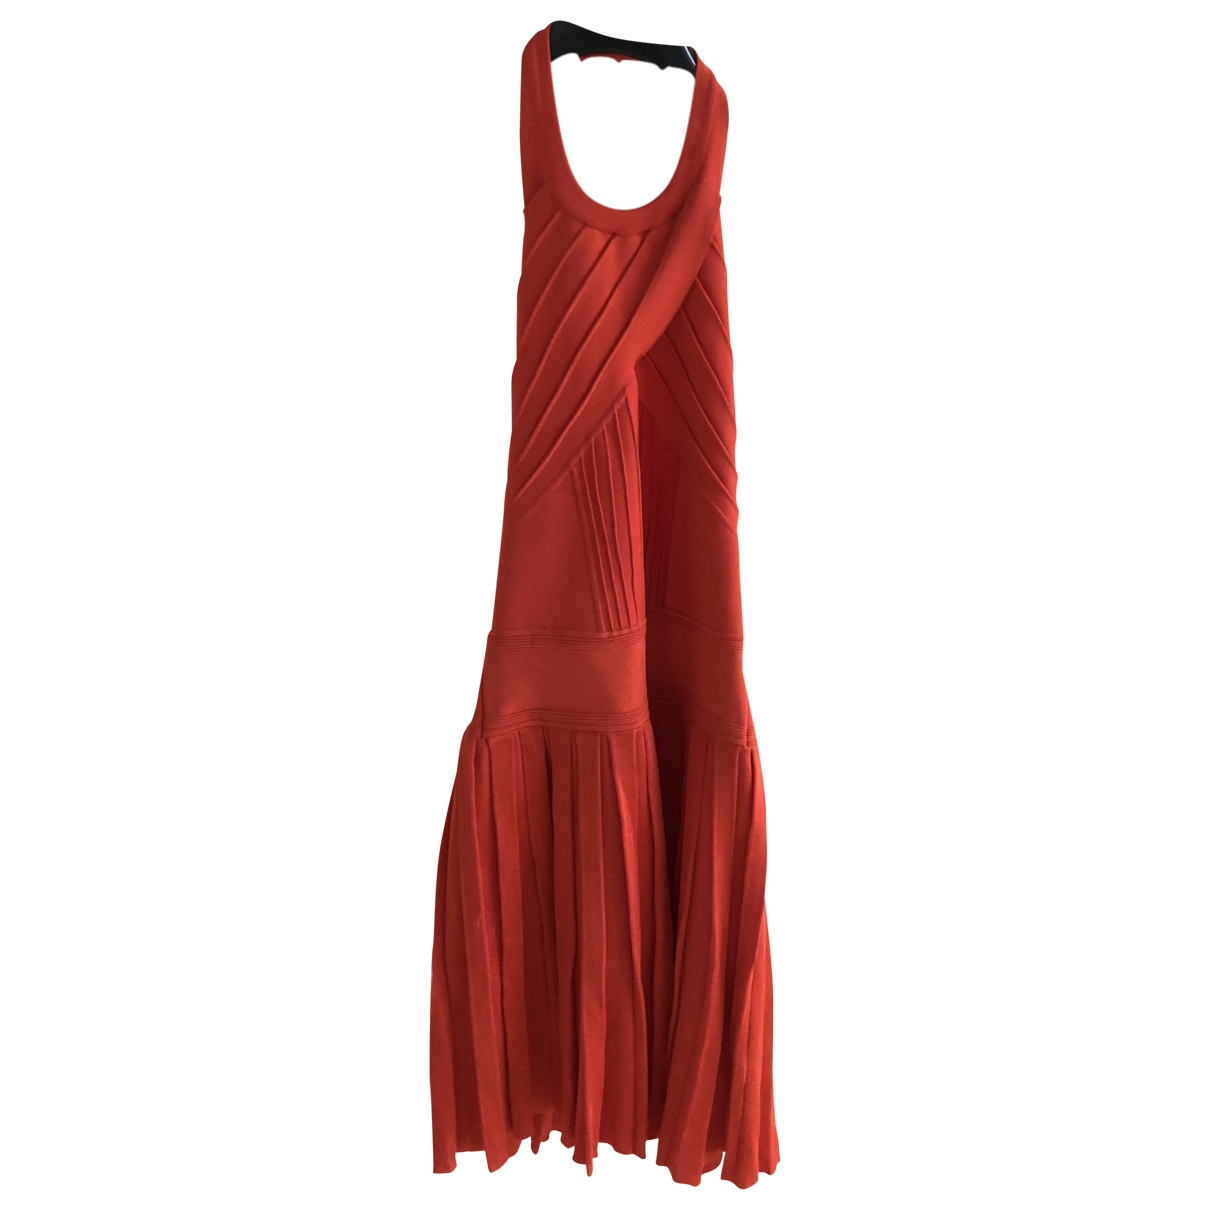 Balmain \N Red dress for Women 36 FR